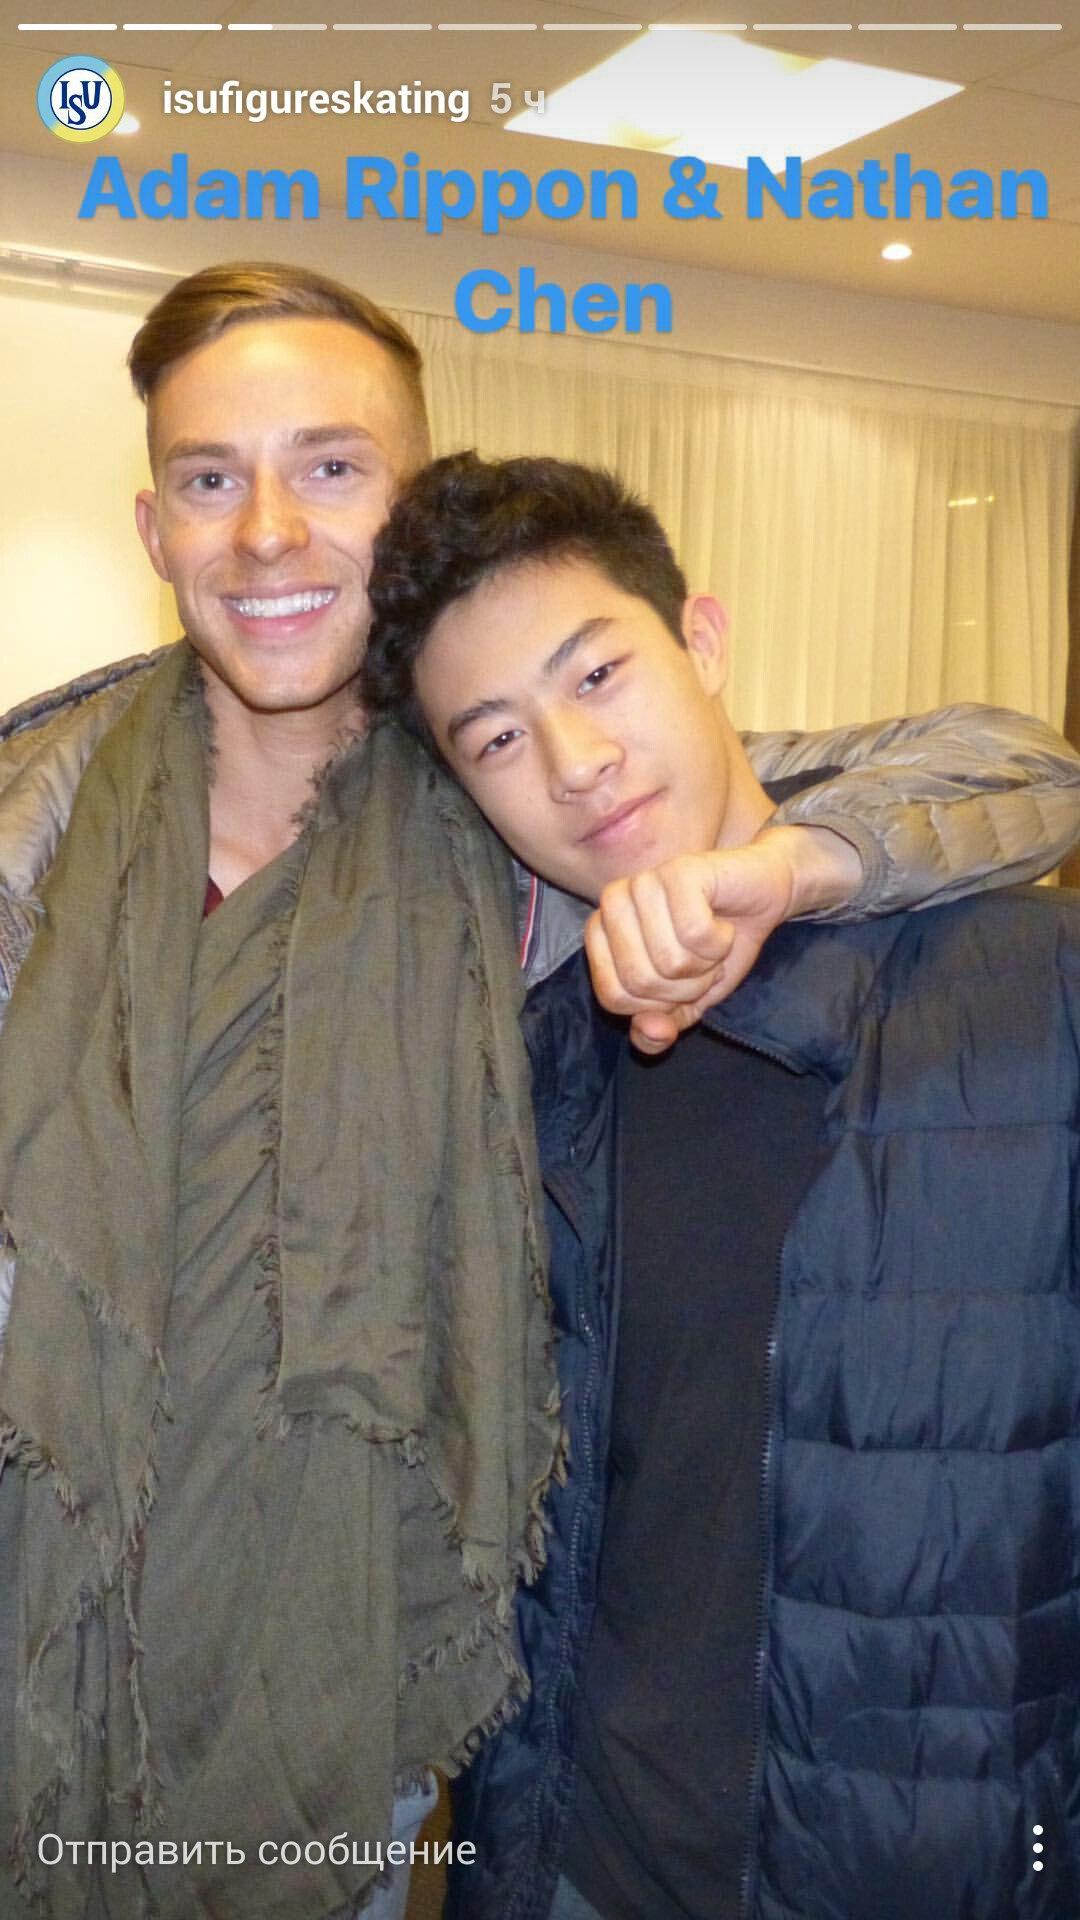 Nathan chen, Adam Rippon